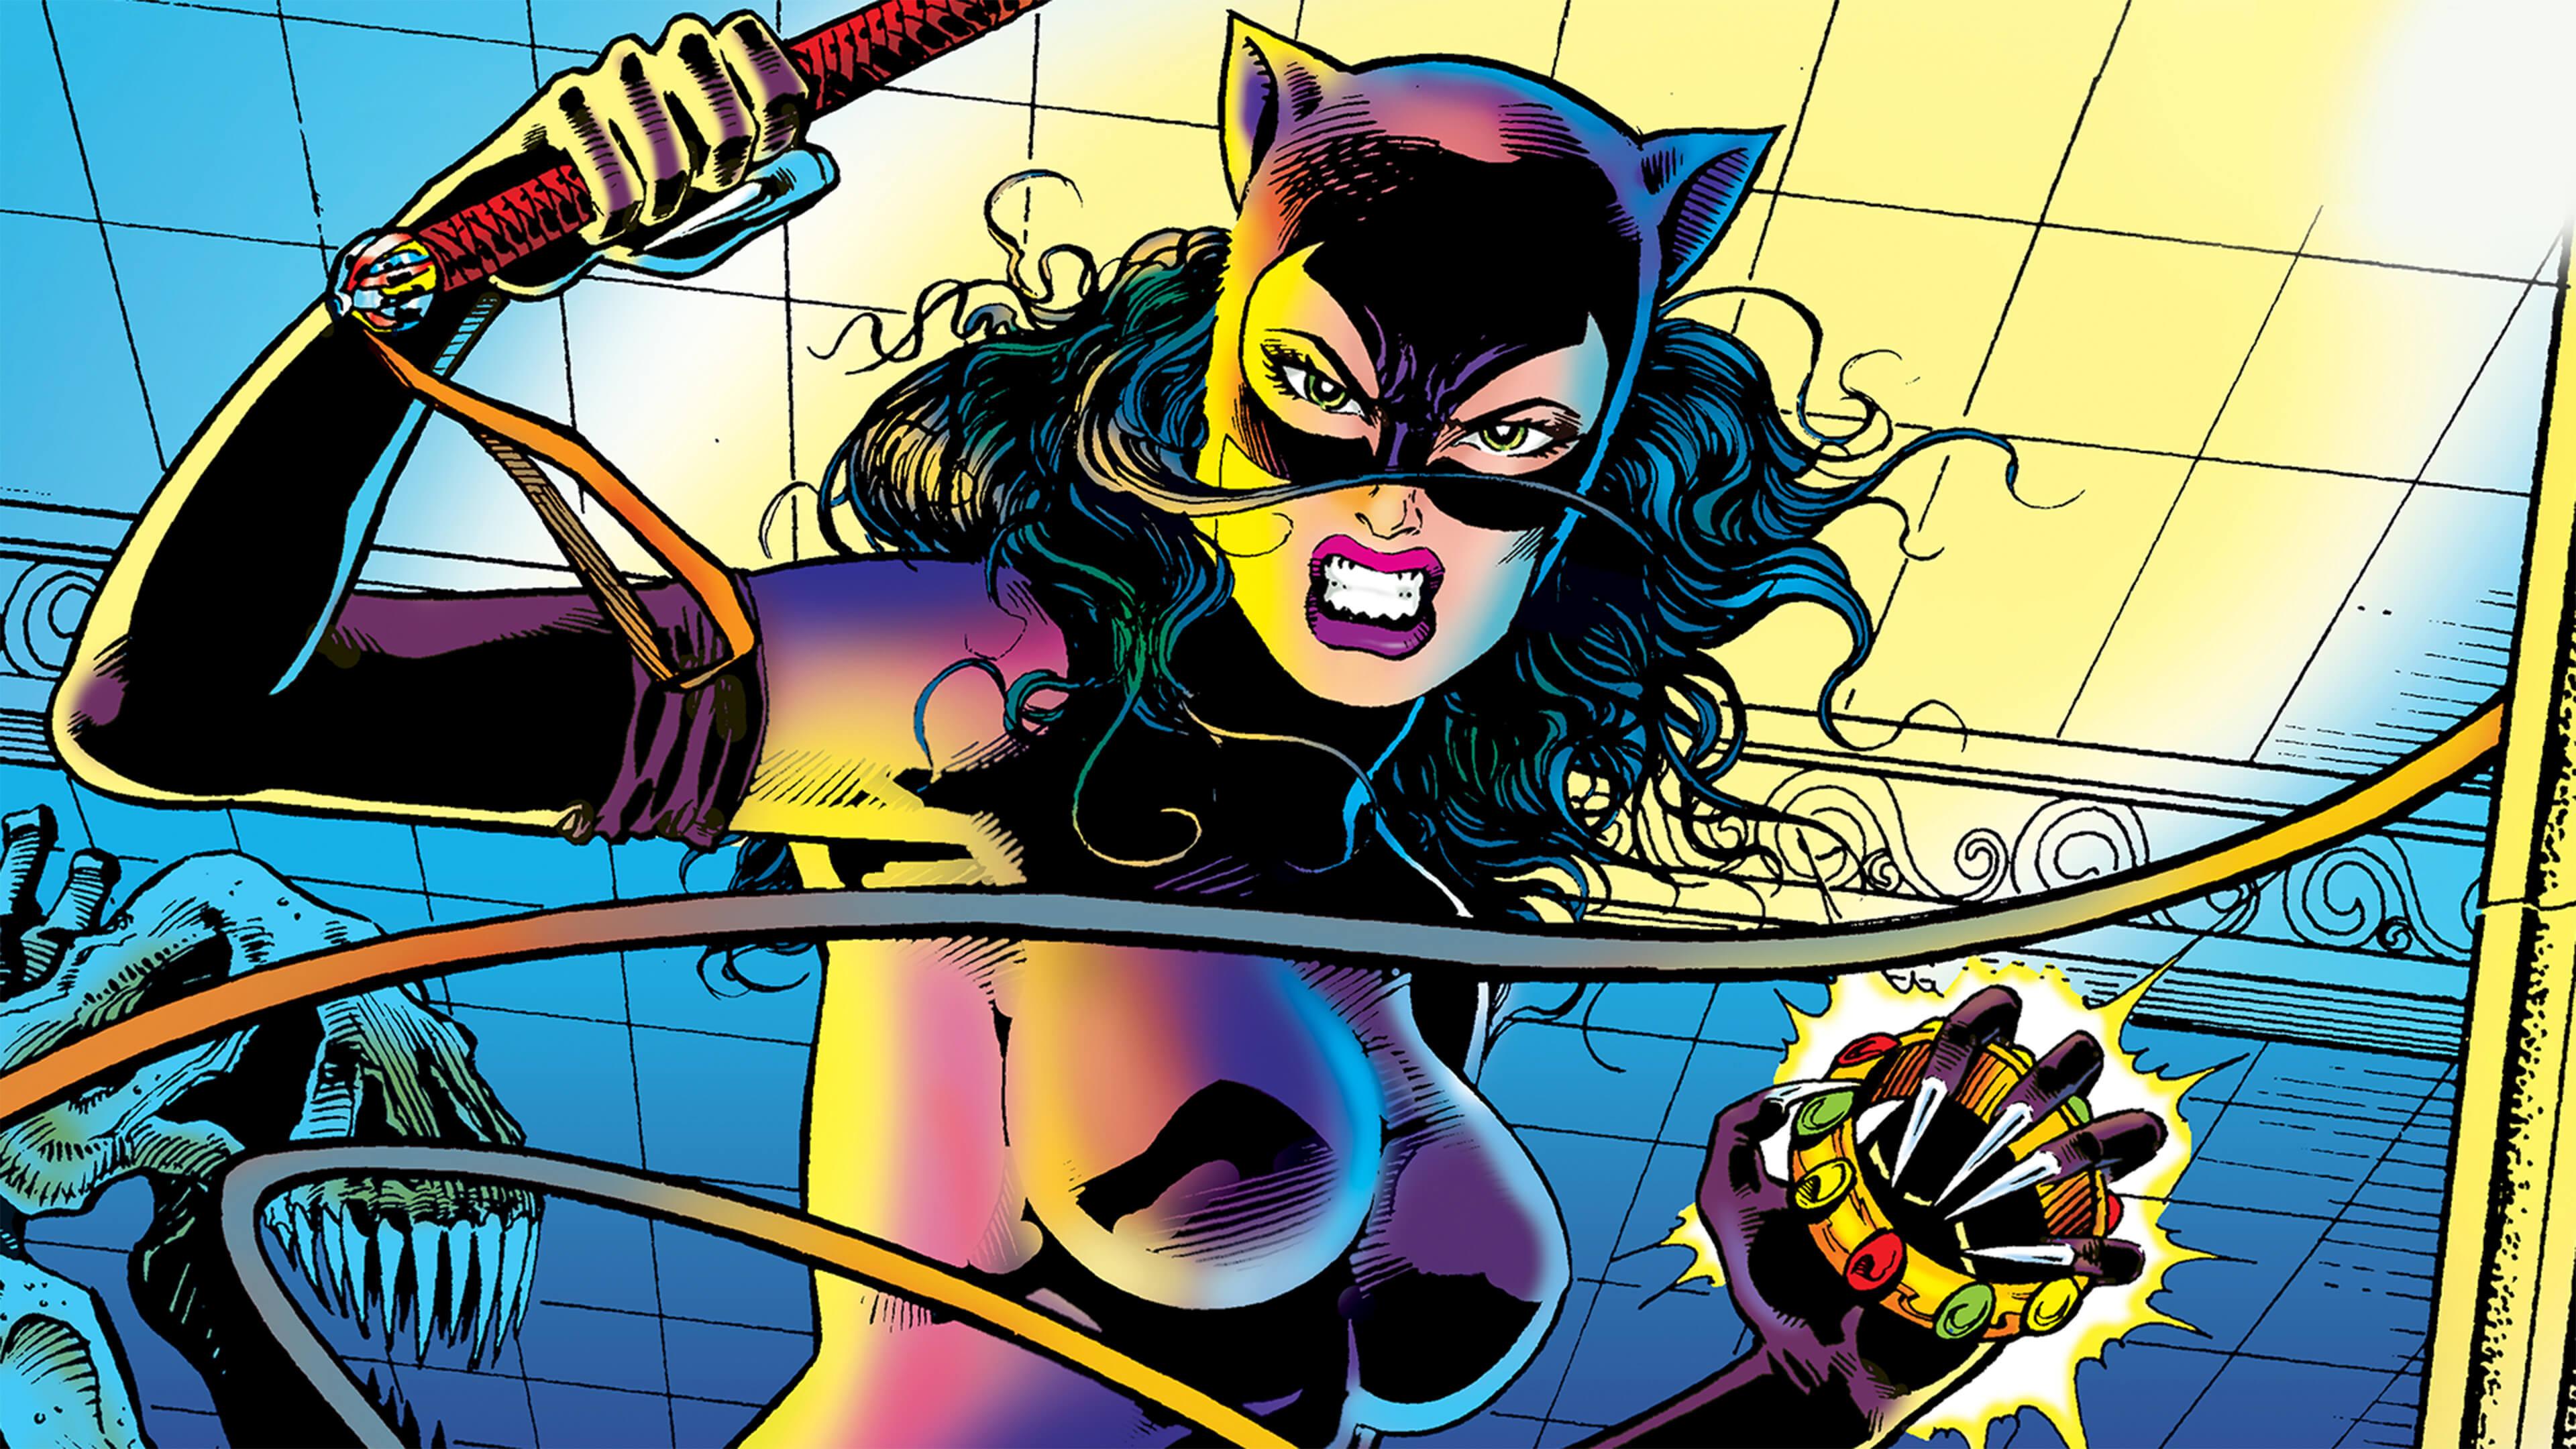 Catwoman's biggest Heist_news_hero-c_v1_200302hero-c2 (update me)-2.jpg